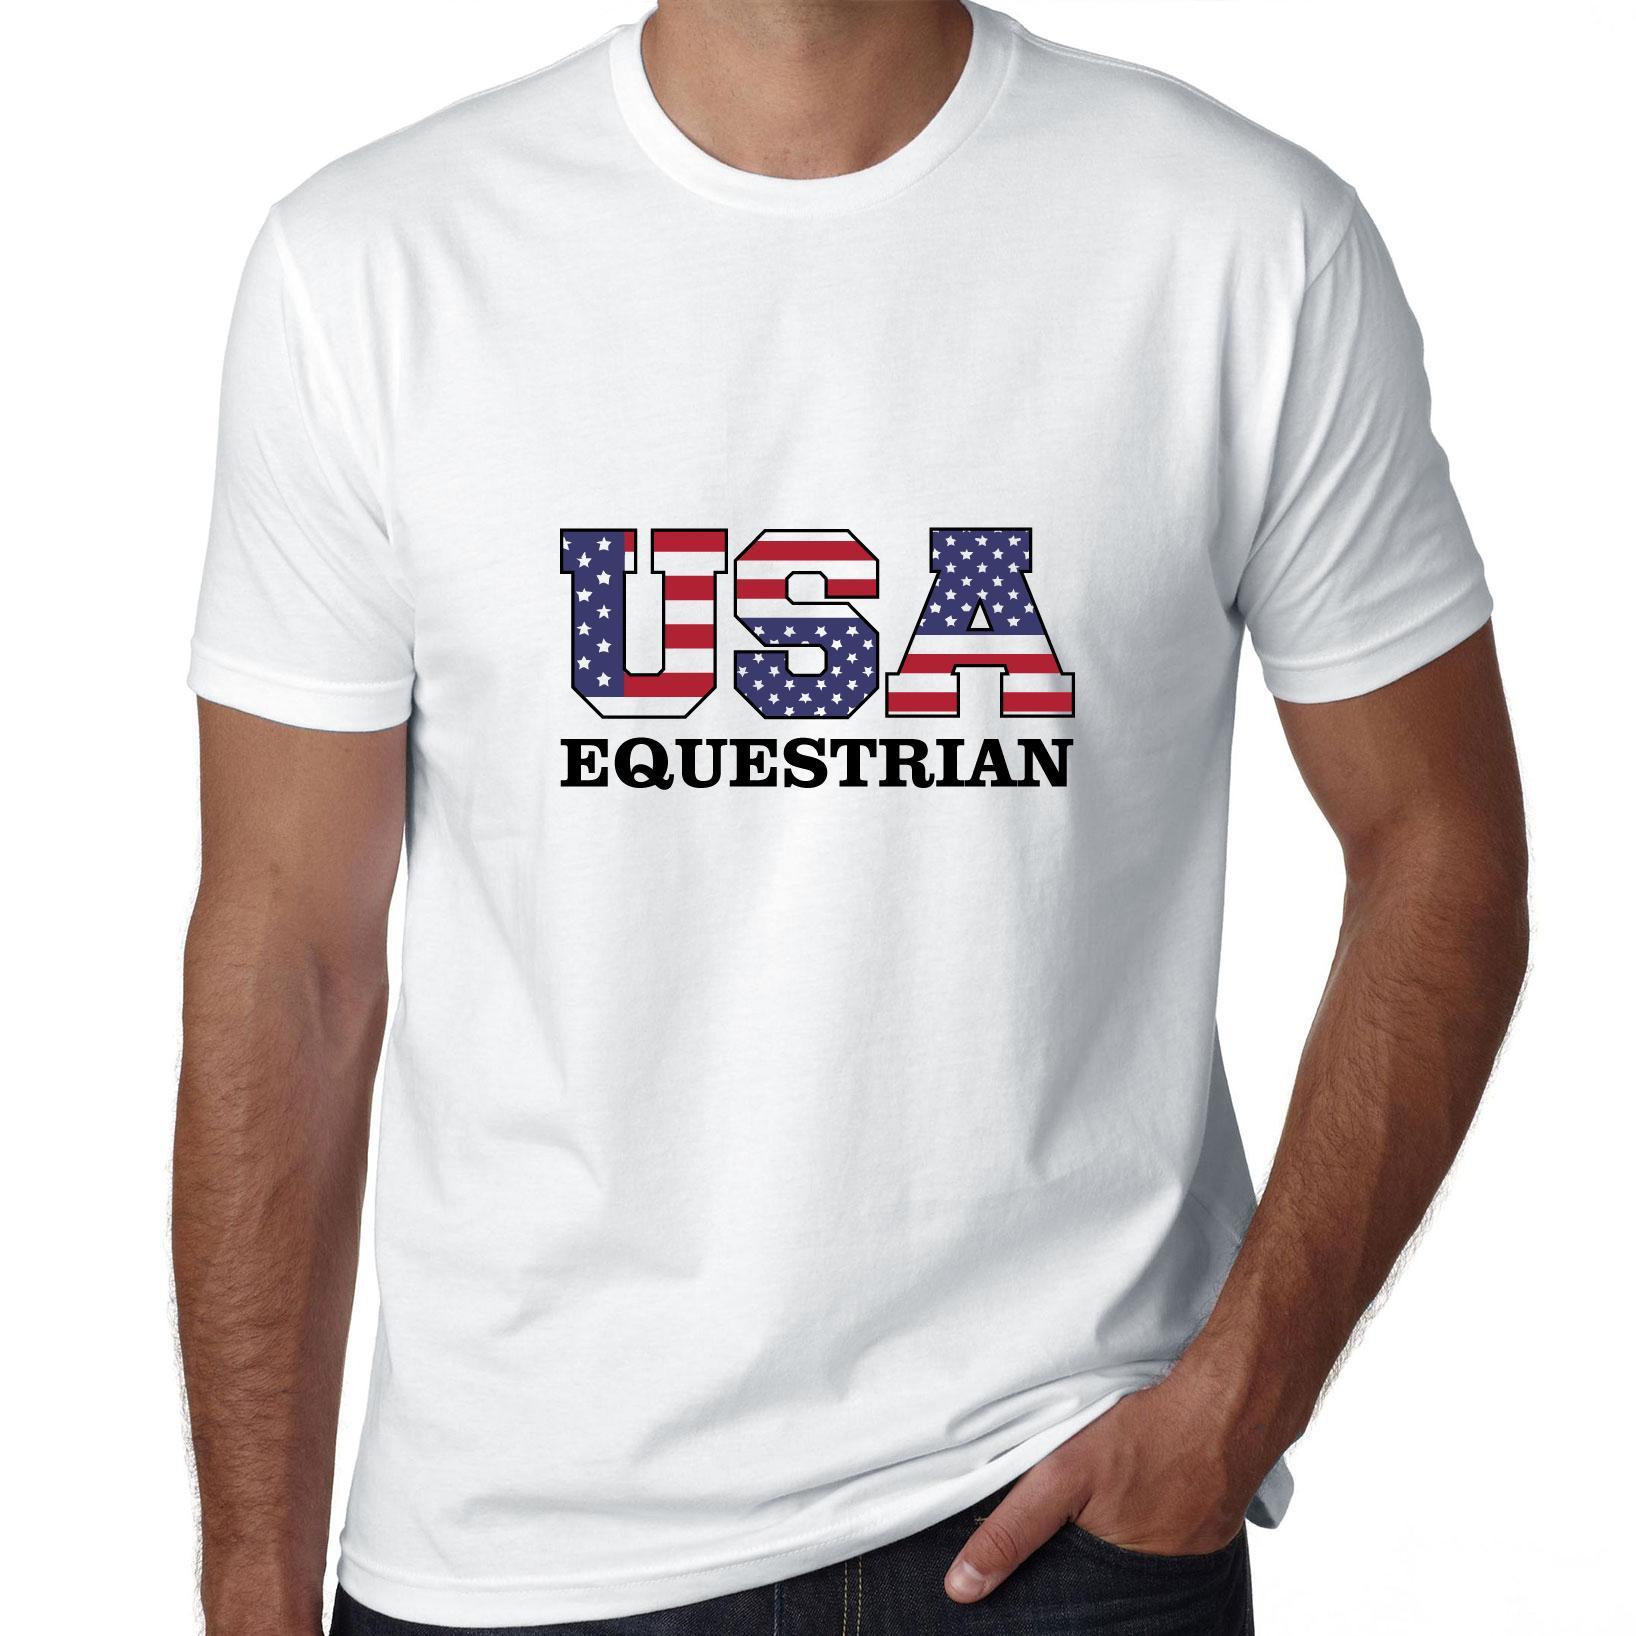 USA Equestrian - Olympic Games - Rio - Flag Men's T-Shirt